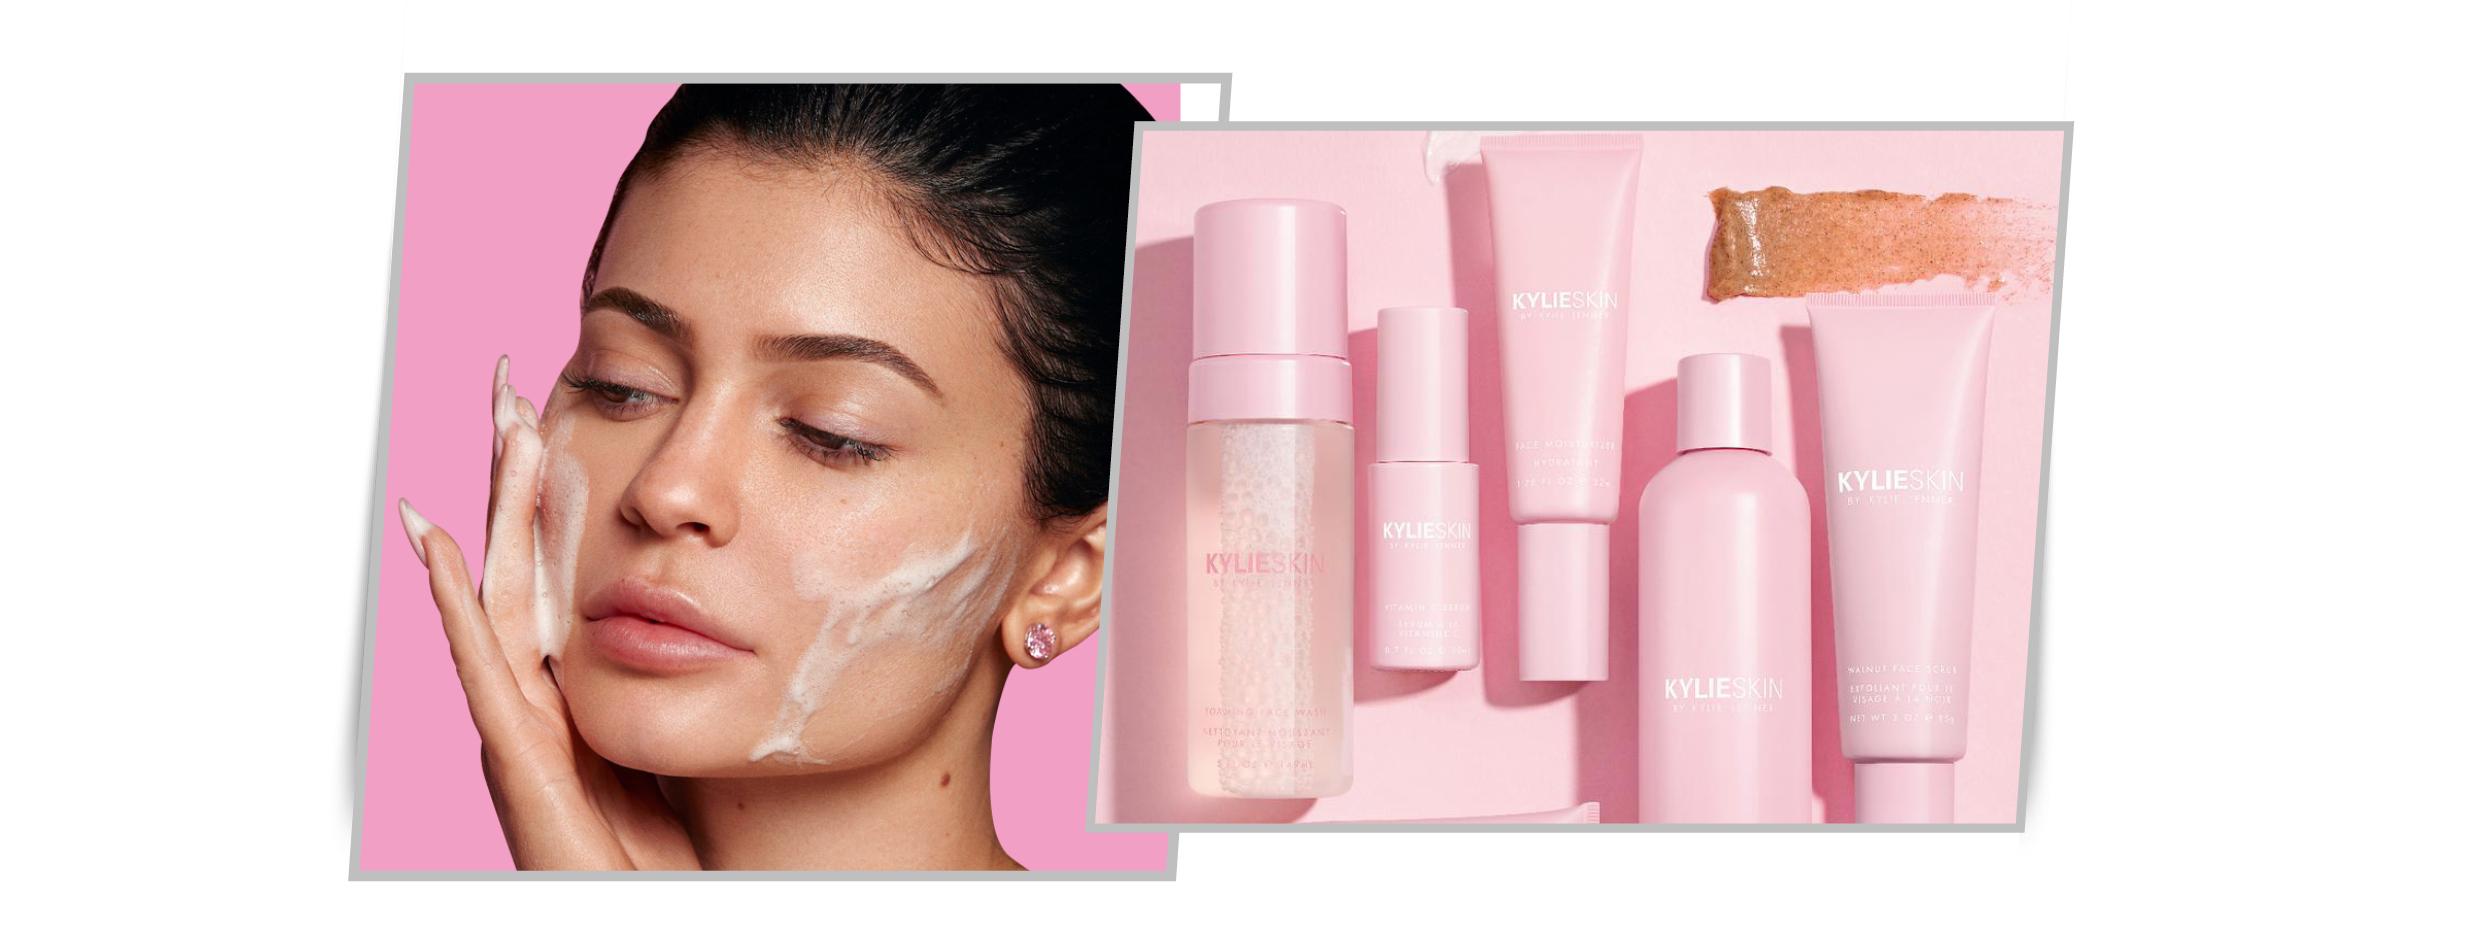 Kylie Skin Kylie Jenner Skincare